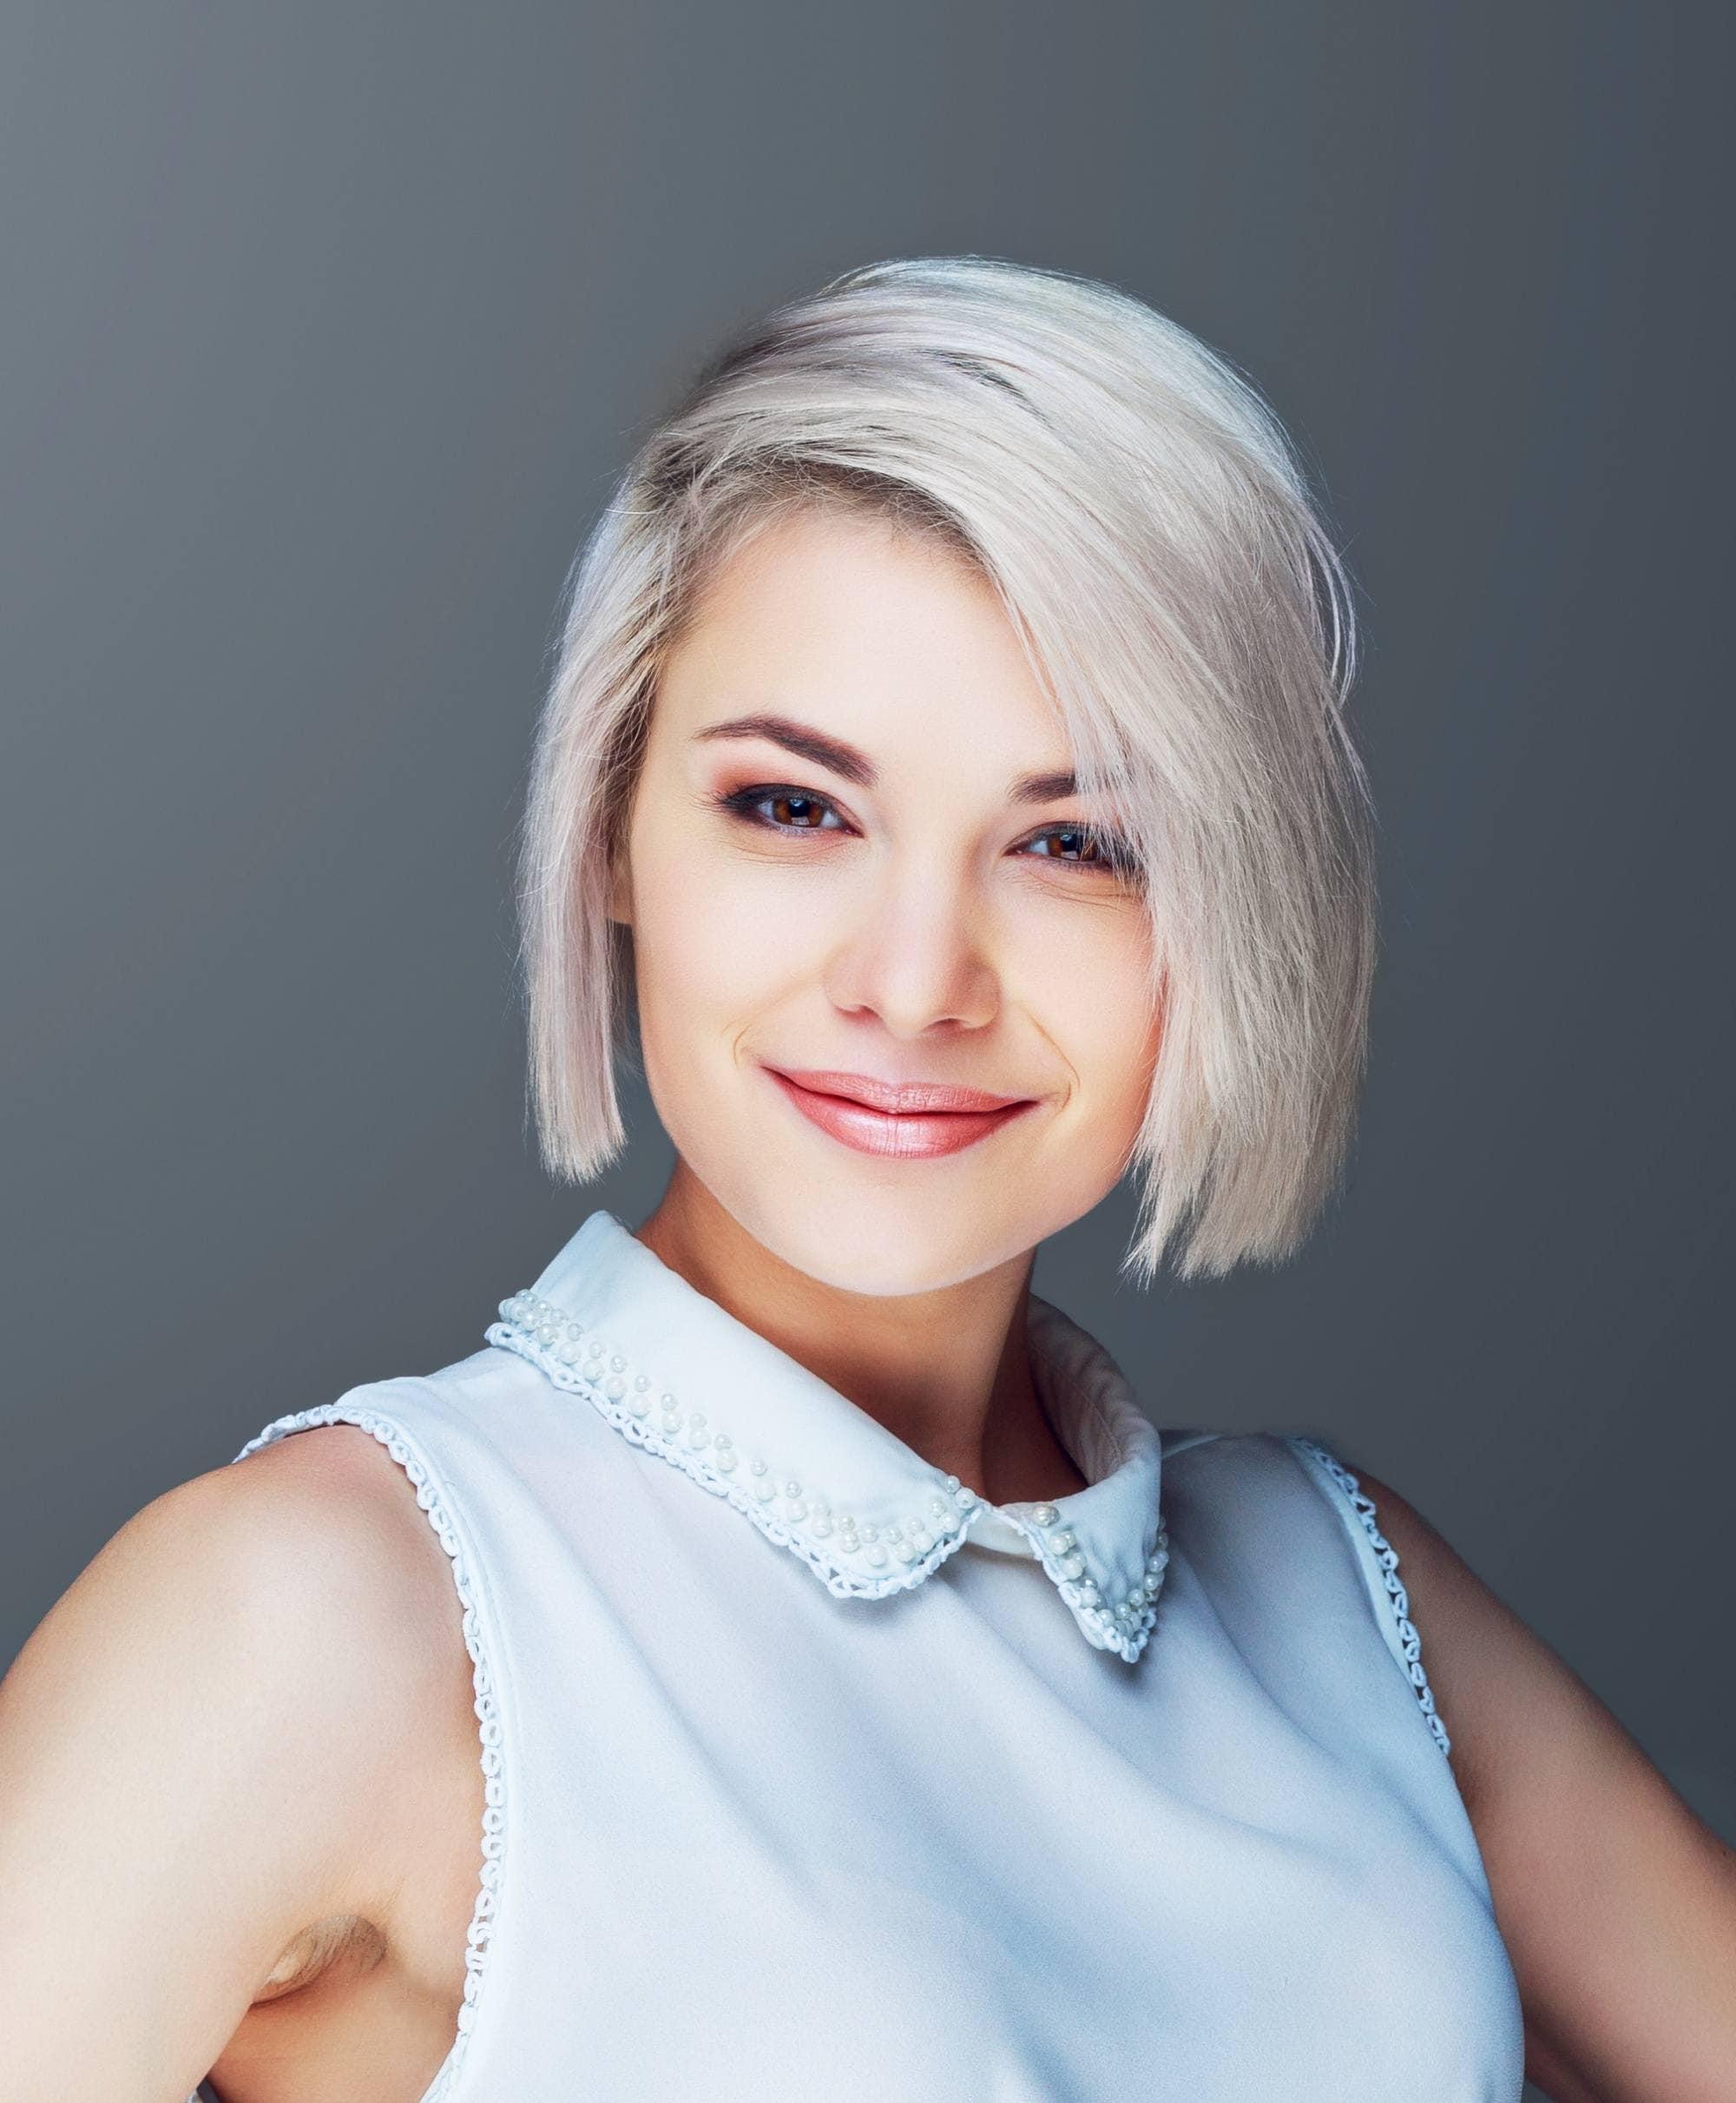 Bob haircuts for fine hair: Closeup shot of a Caucasian woman with short blonde hair smiling